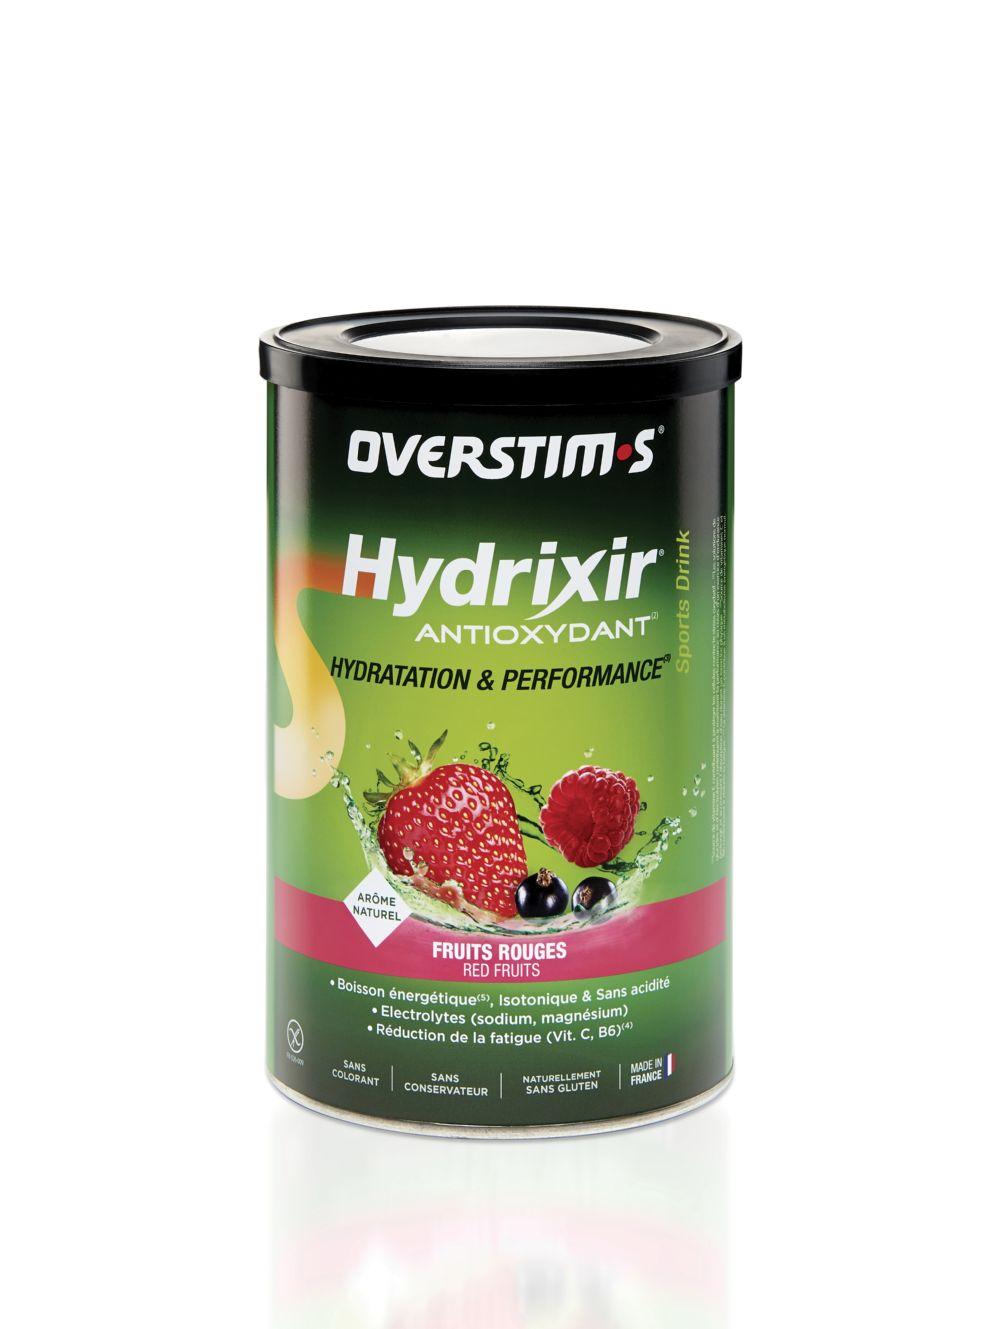 HYDRIXIR ANTIOXIDANT FRUTOS ROJOS 600gr